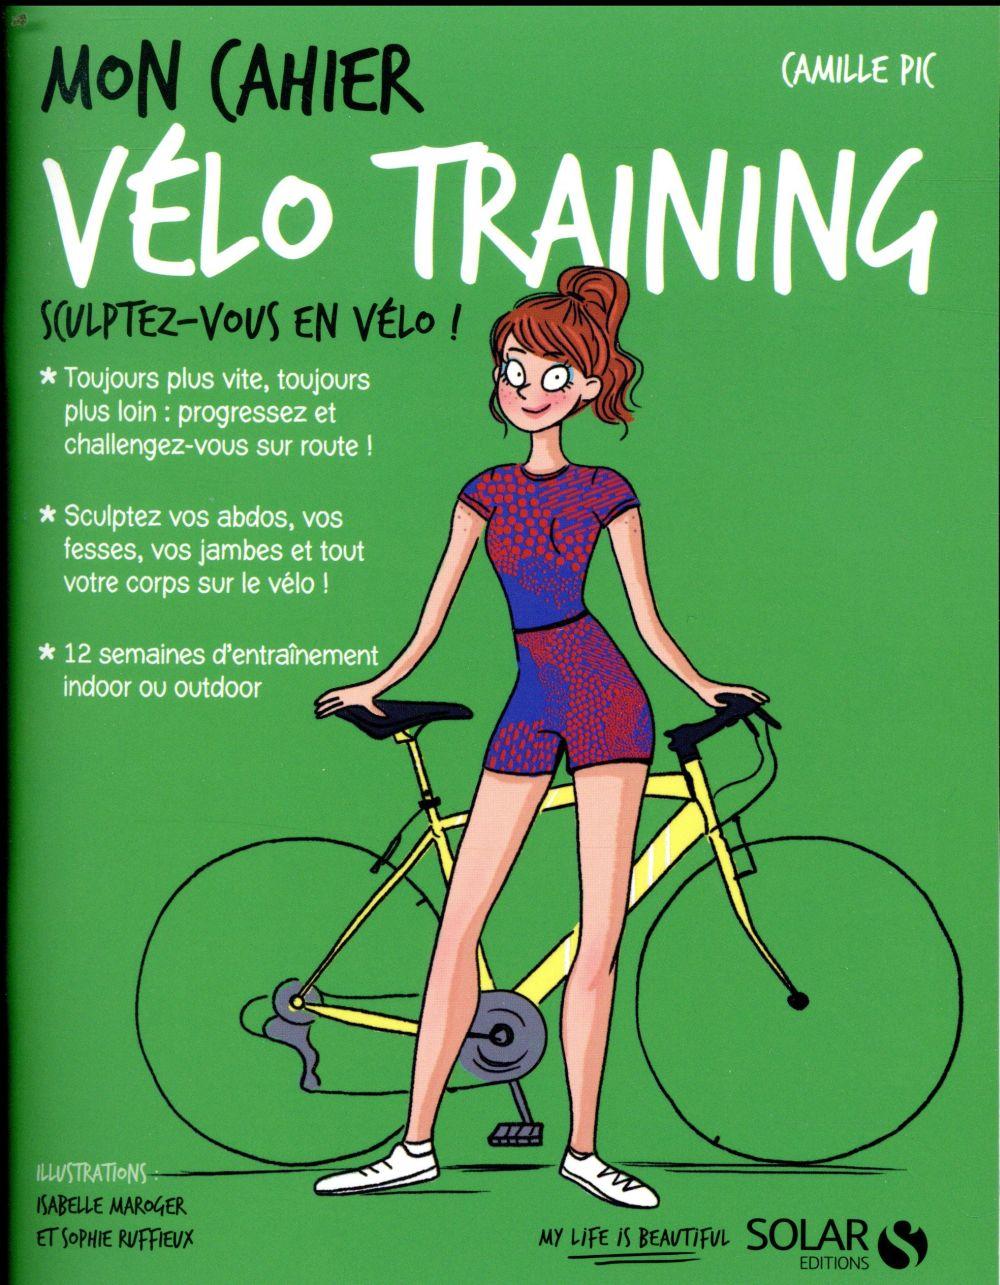 MON CAHIER ; vélo training